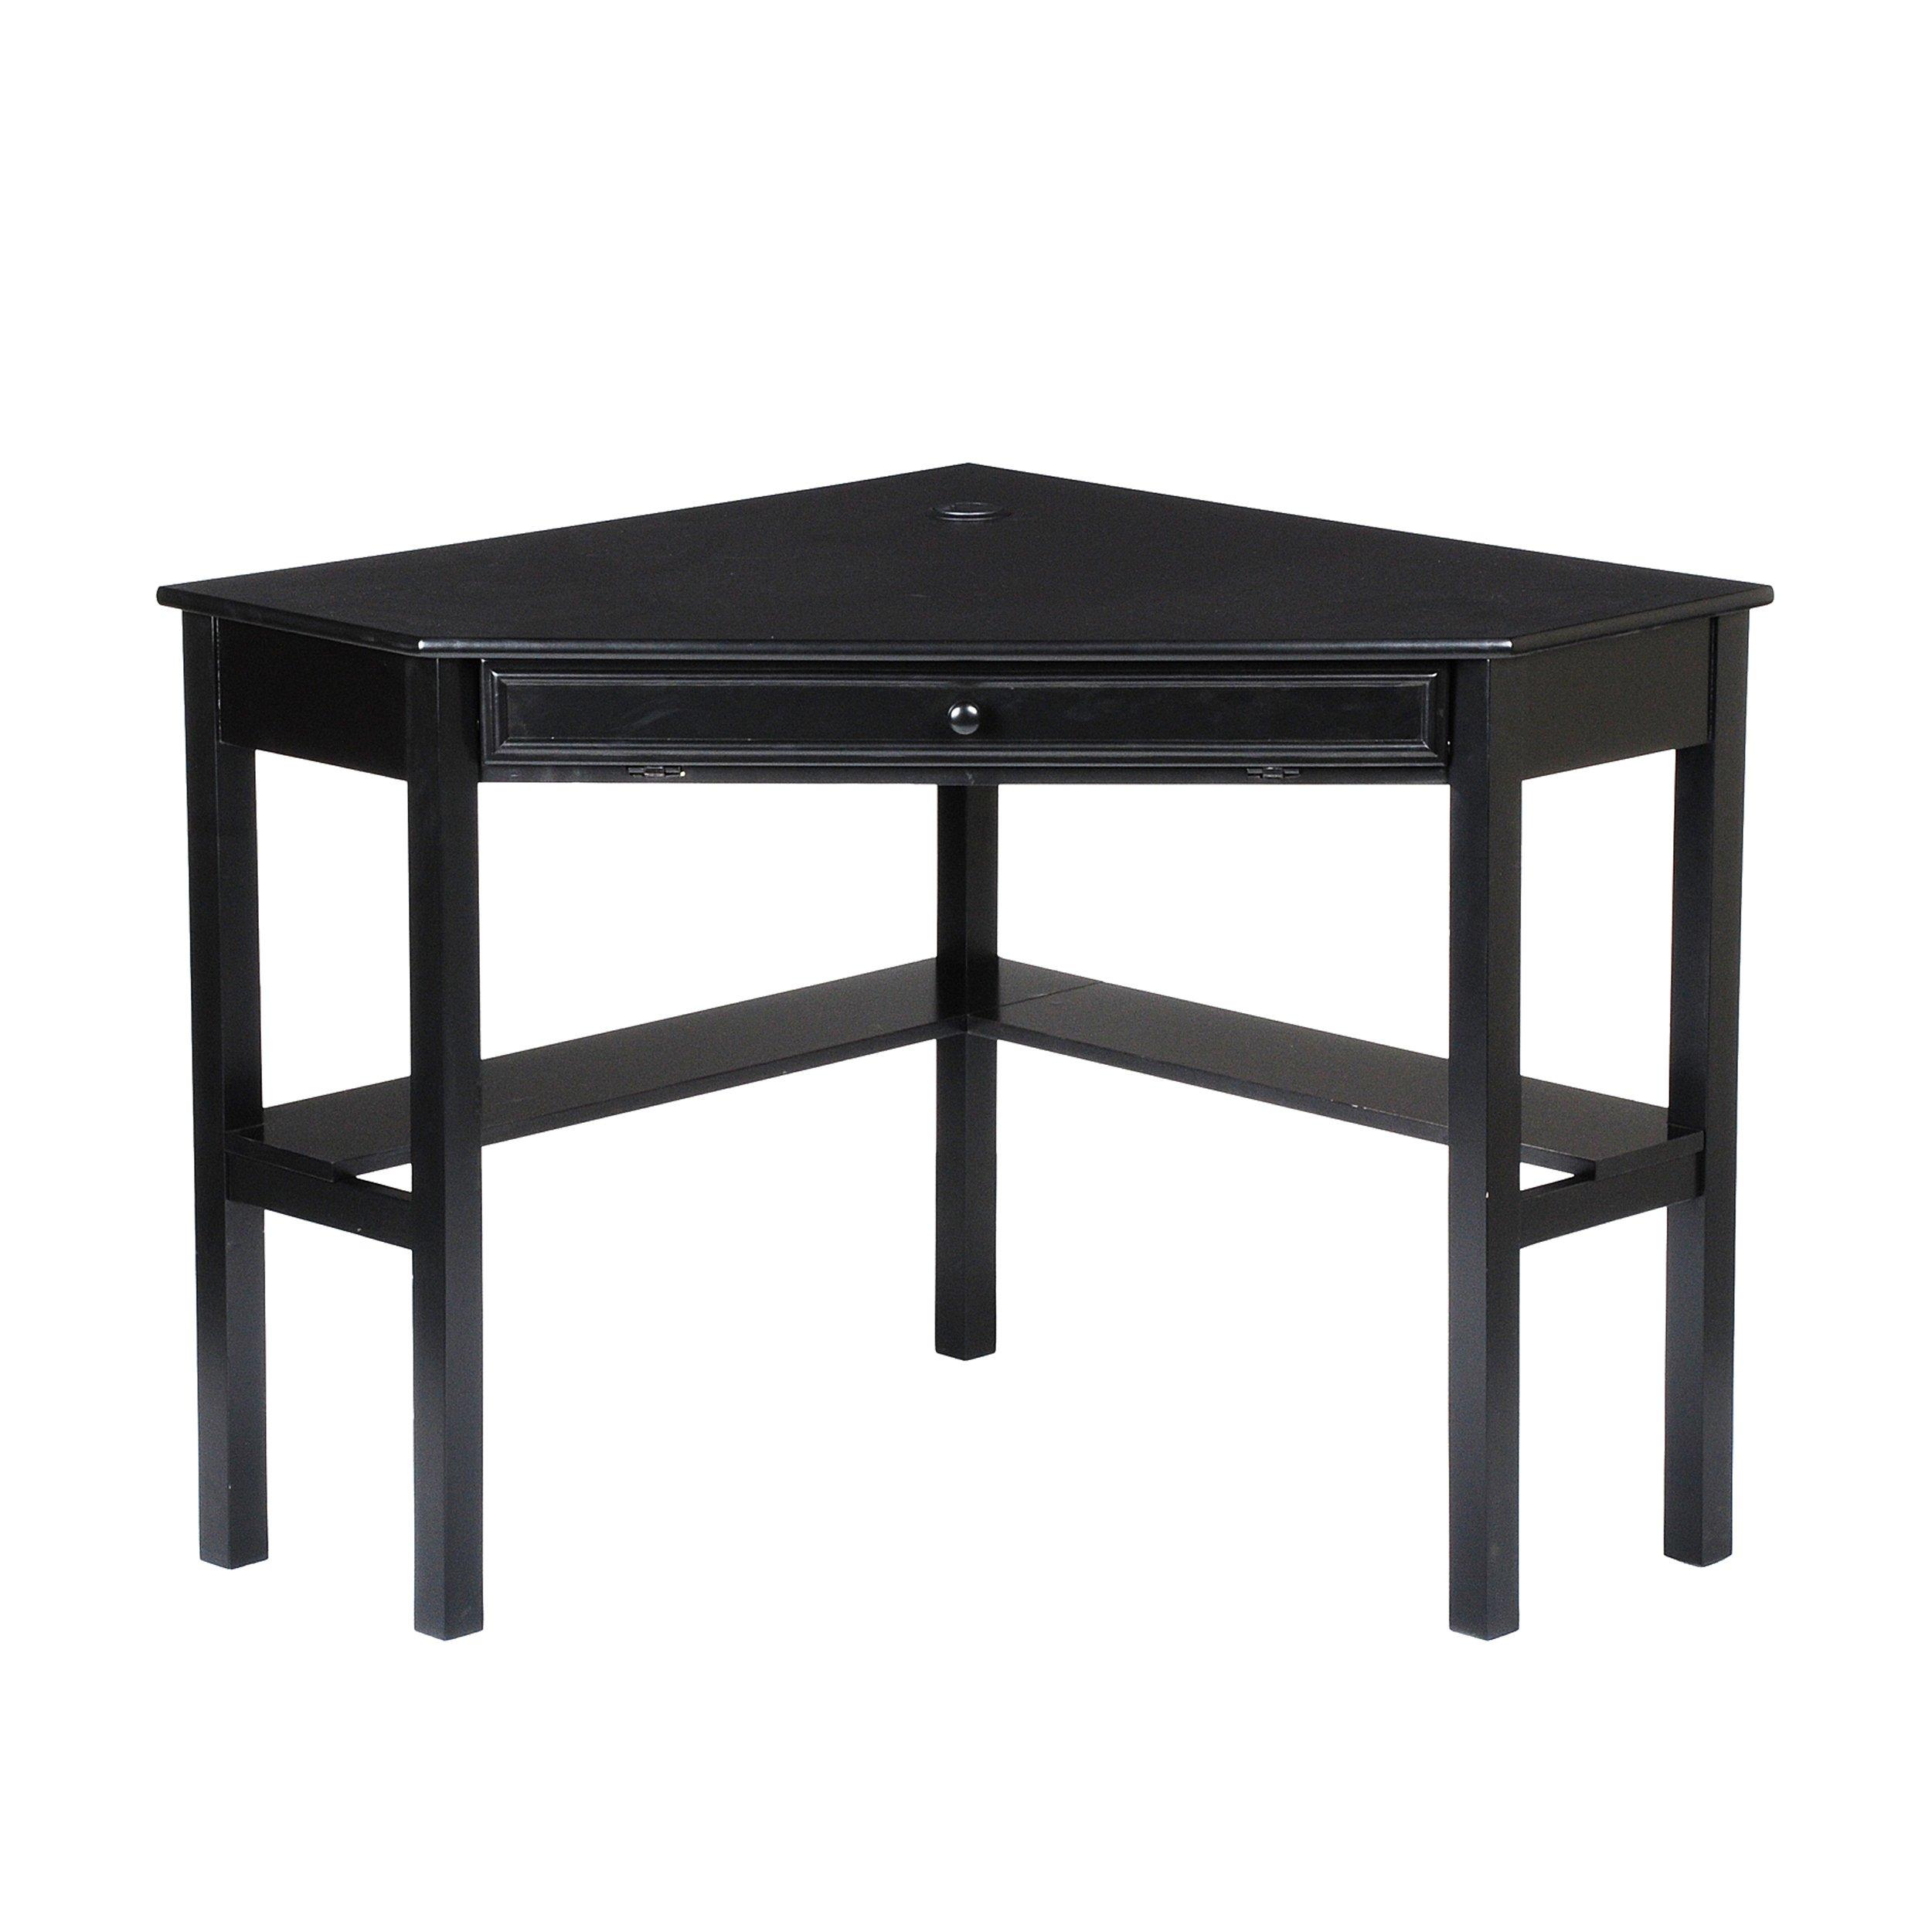 Southern Enterprises Corner Computer Desk 48'' Wide, Painted Black Finish by SEI